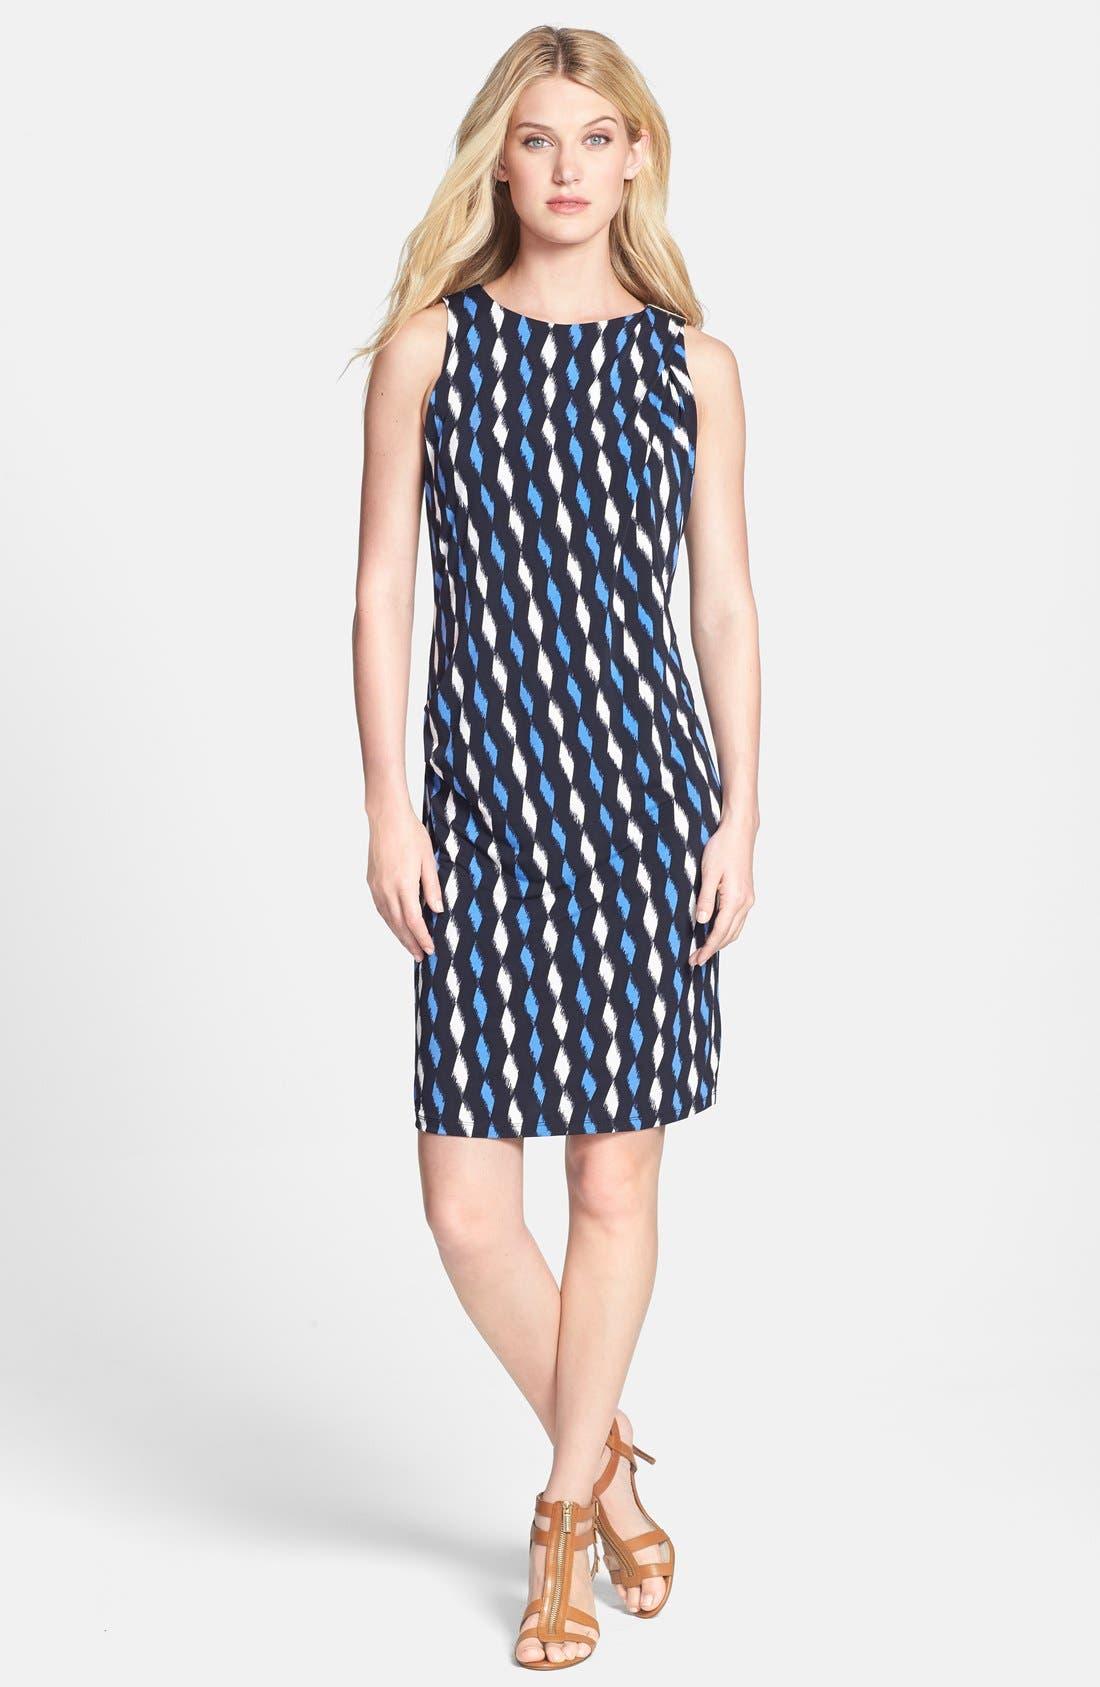 Alternate Image 1 Selected - MICHAEL Michael Kors 'Loom' Print Sheath Dress